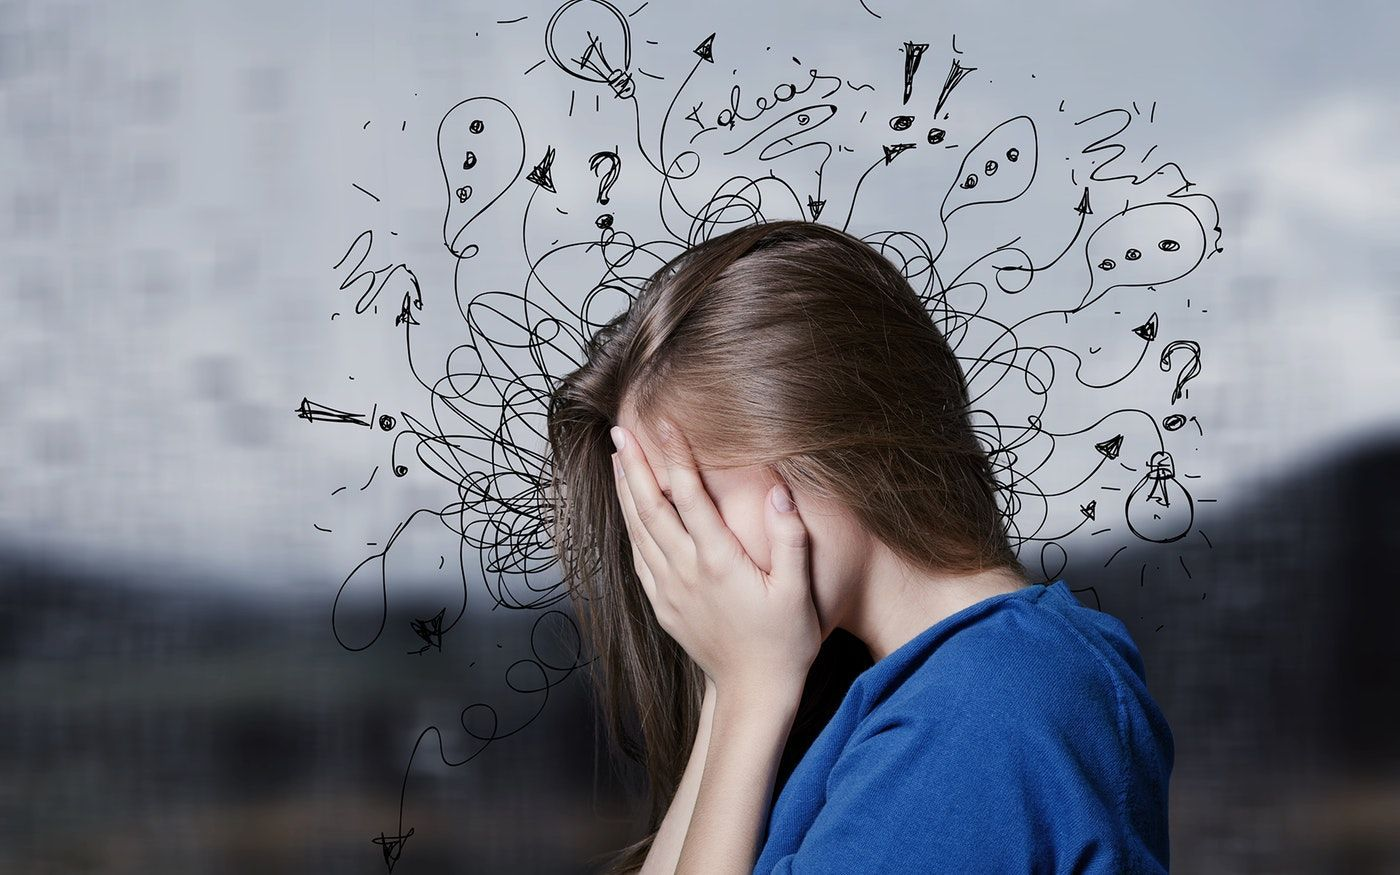 Ansiedade Generalizada: Sabe Identificar Os Sintomas?